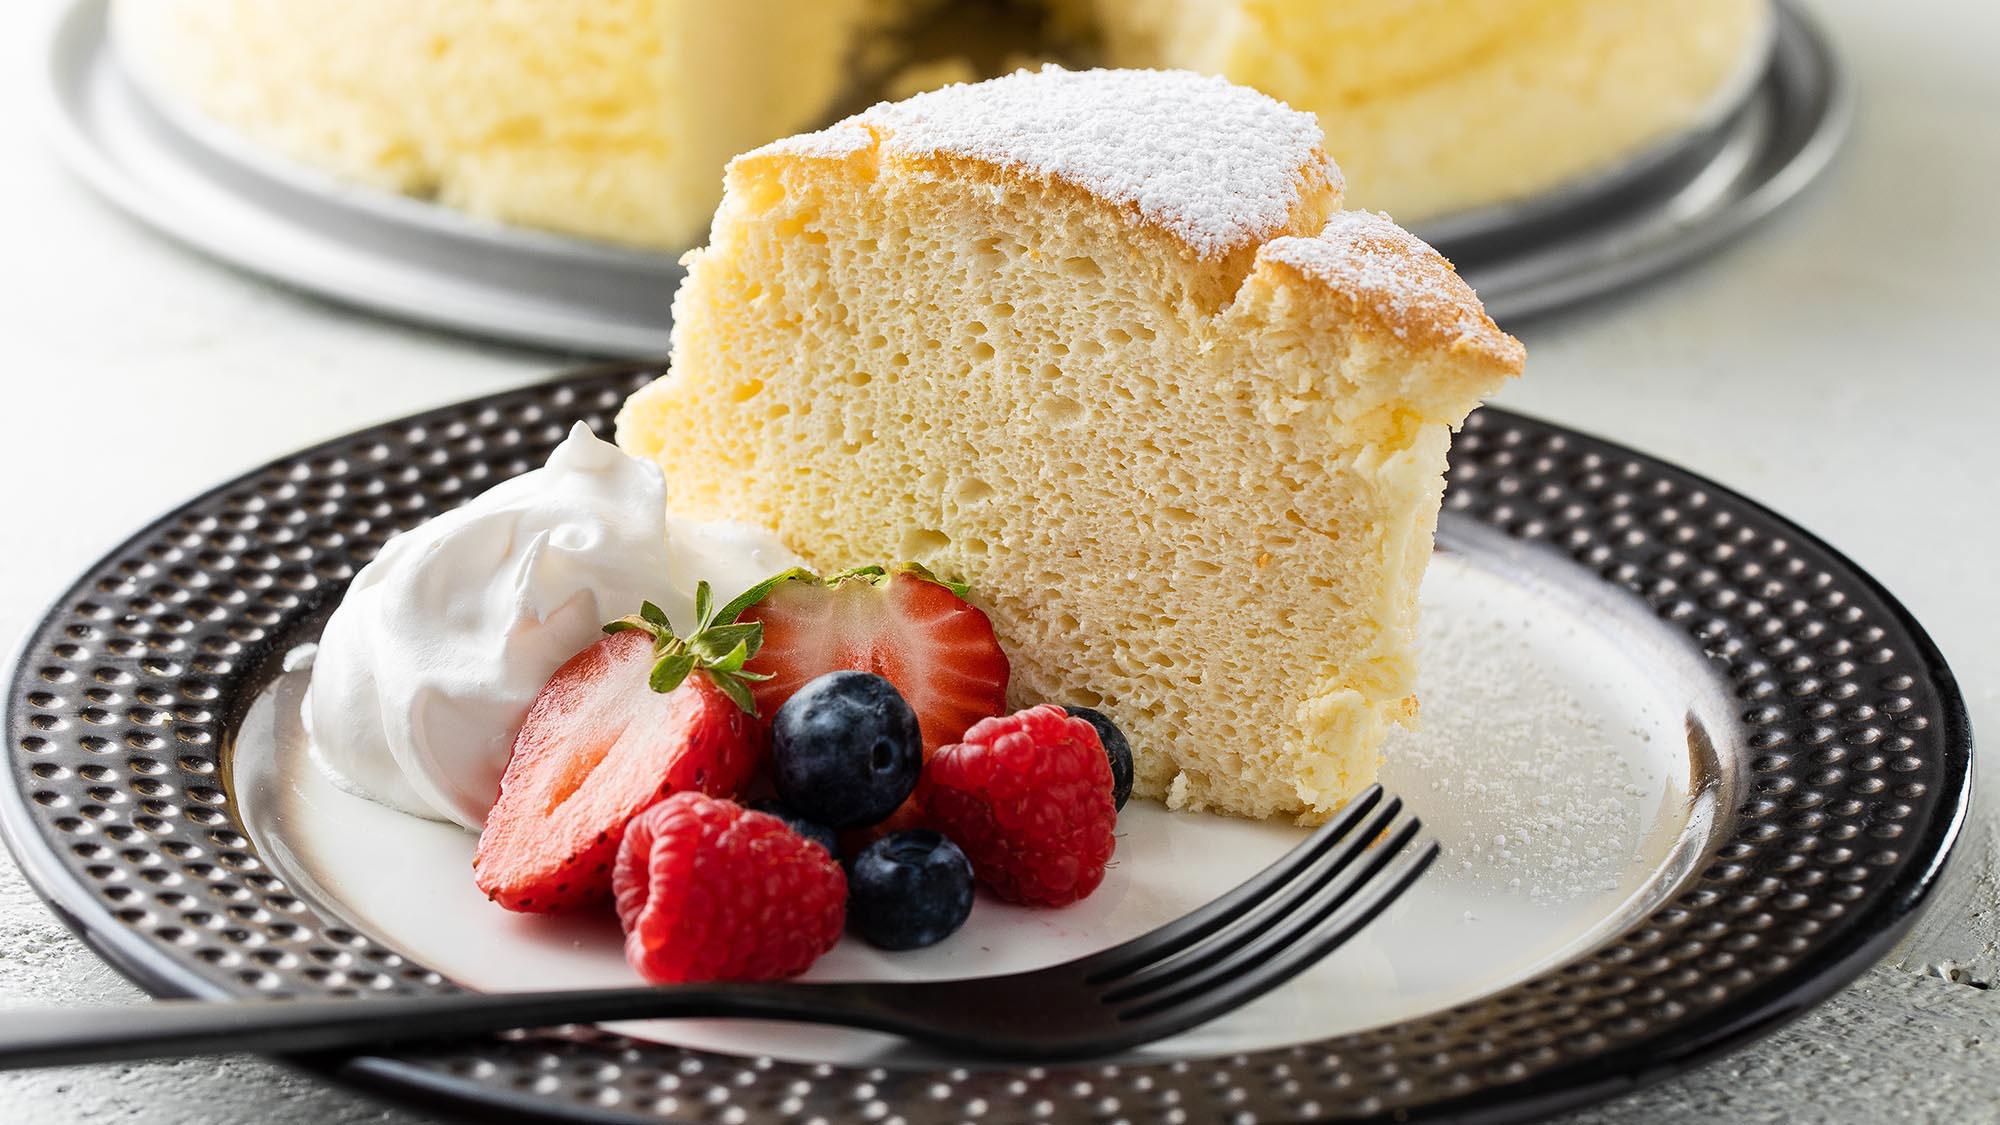 japanese_jiggle_cake_2000x1125.jpg